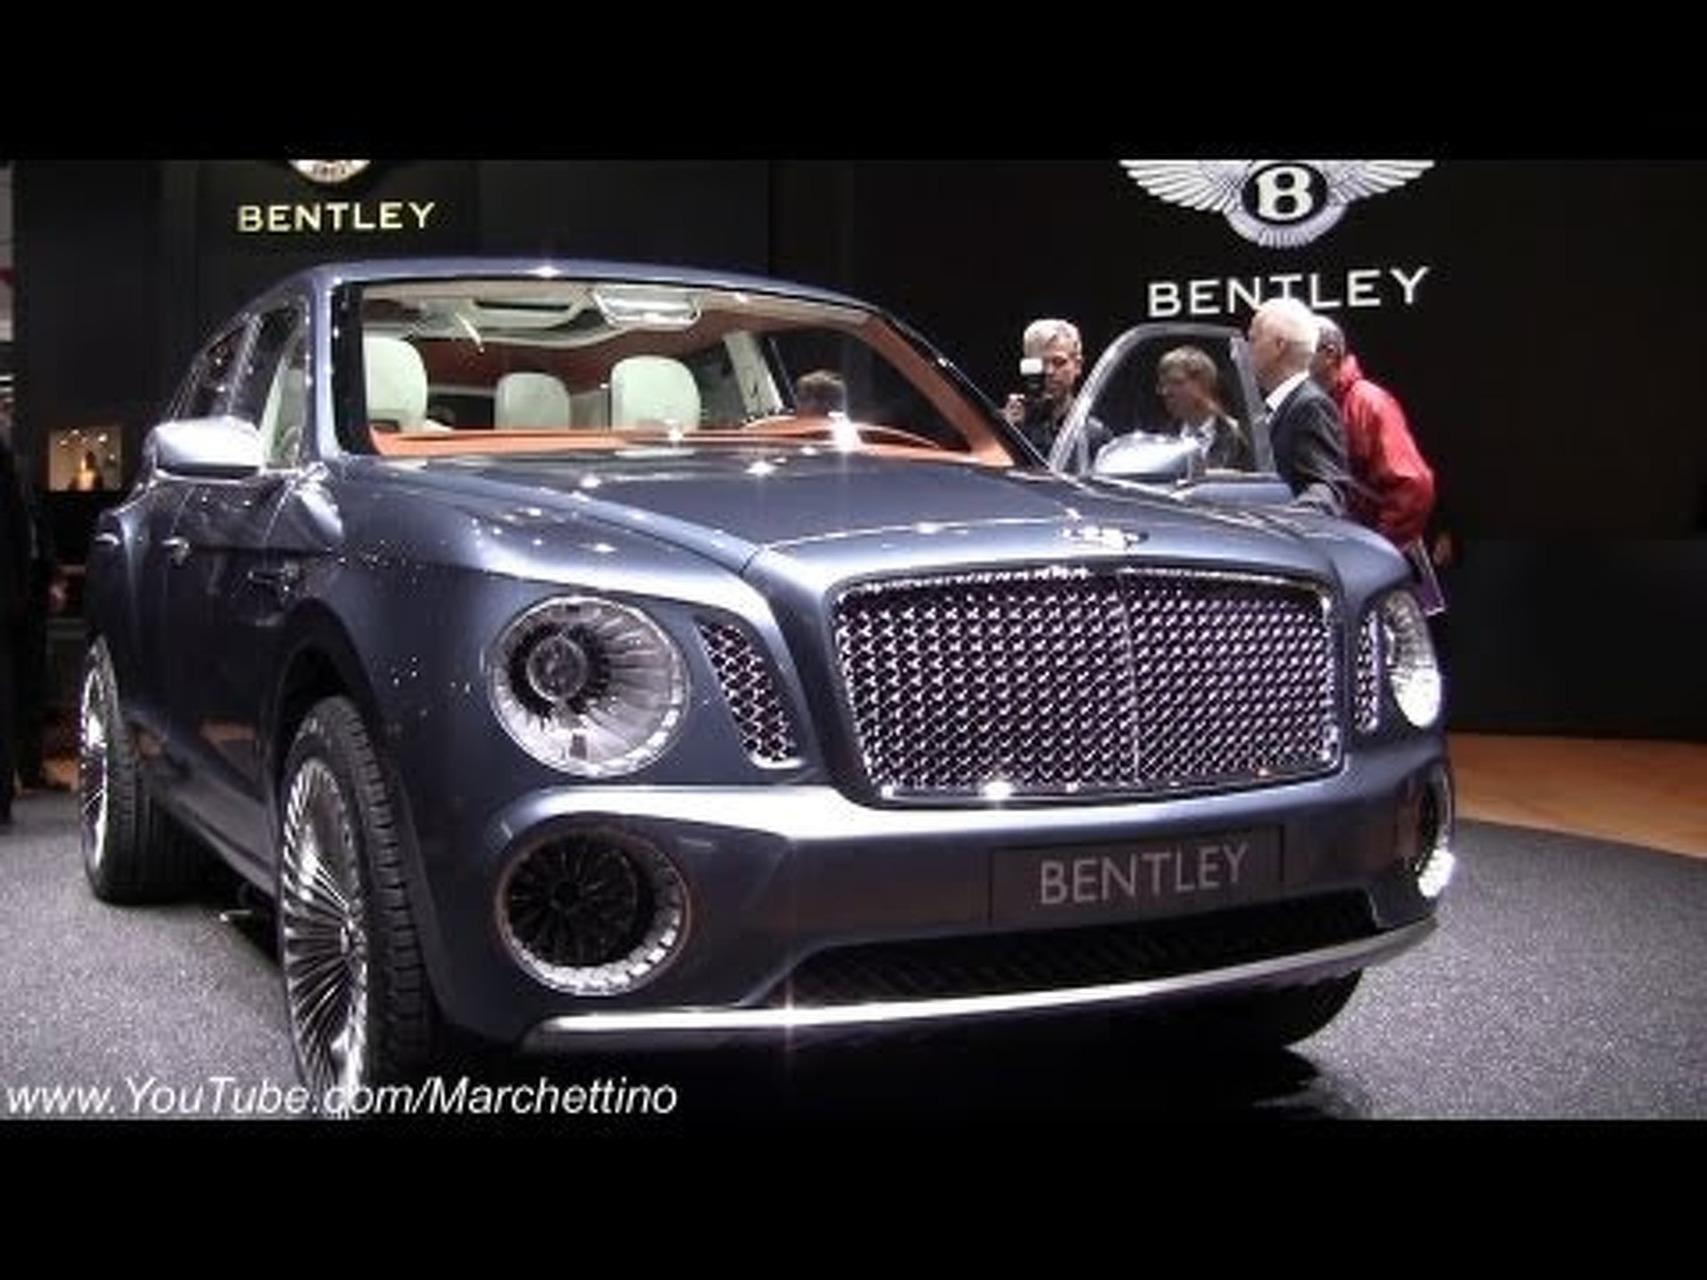 2013 Bentley EXP 9 F Concept SUV - 2012 Geneva Motor Show